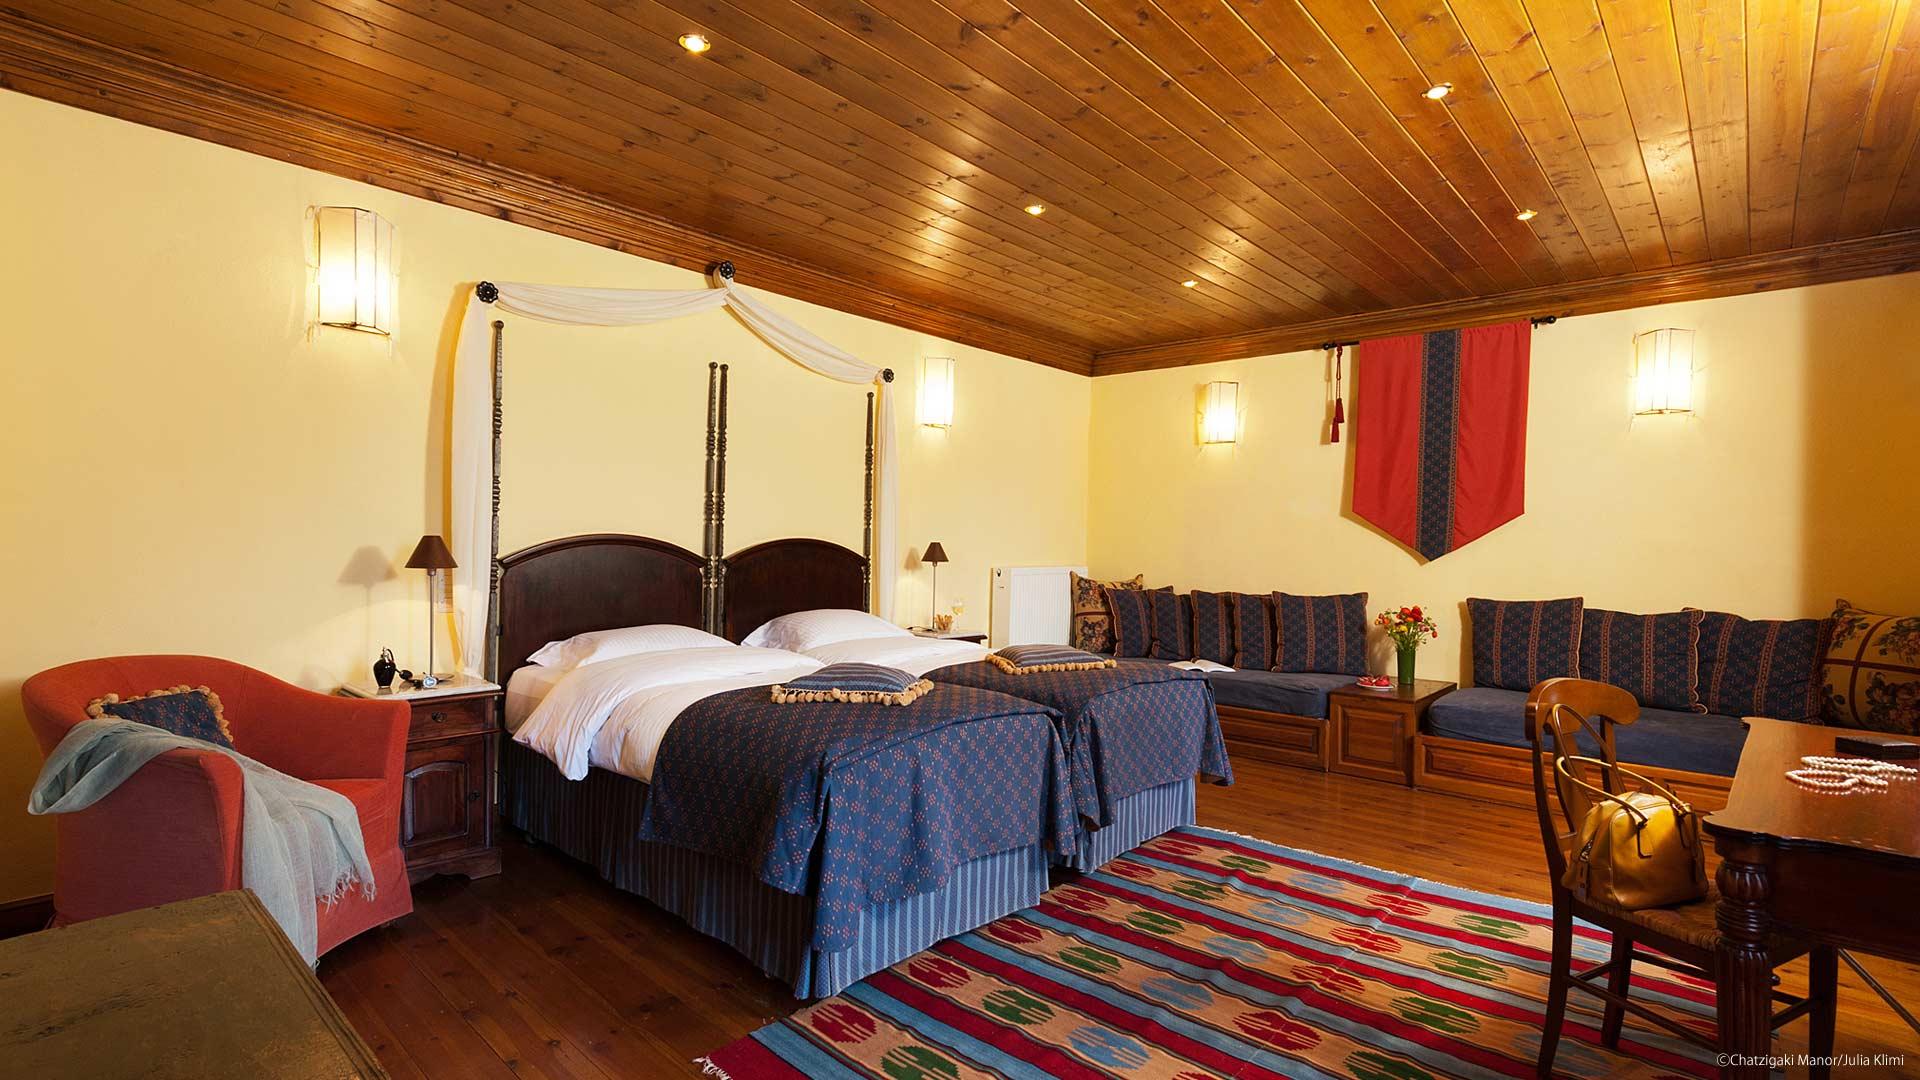 Garden Residence δωμάτιο Ξενοδεοχείο Αρχοντικό Χατζηγάκη, Περτούλι